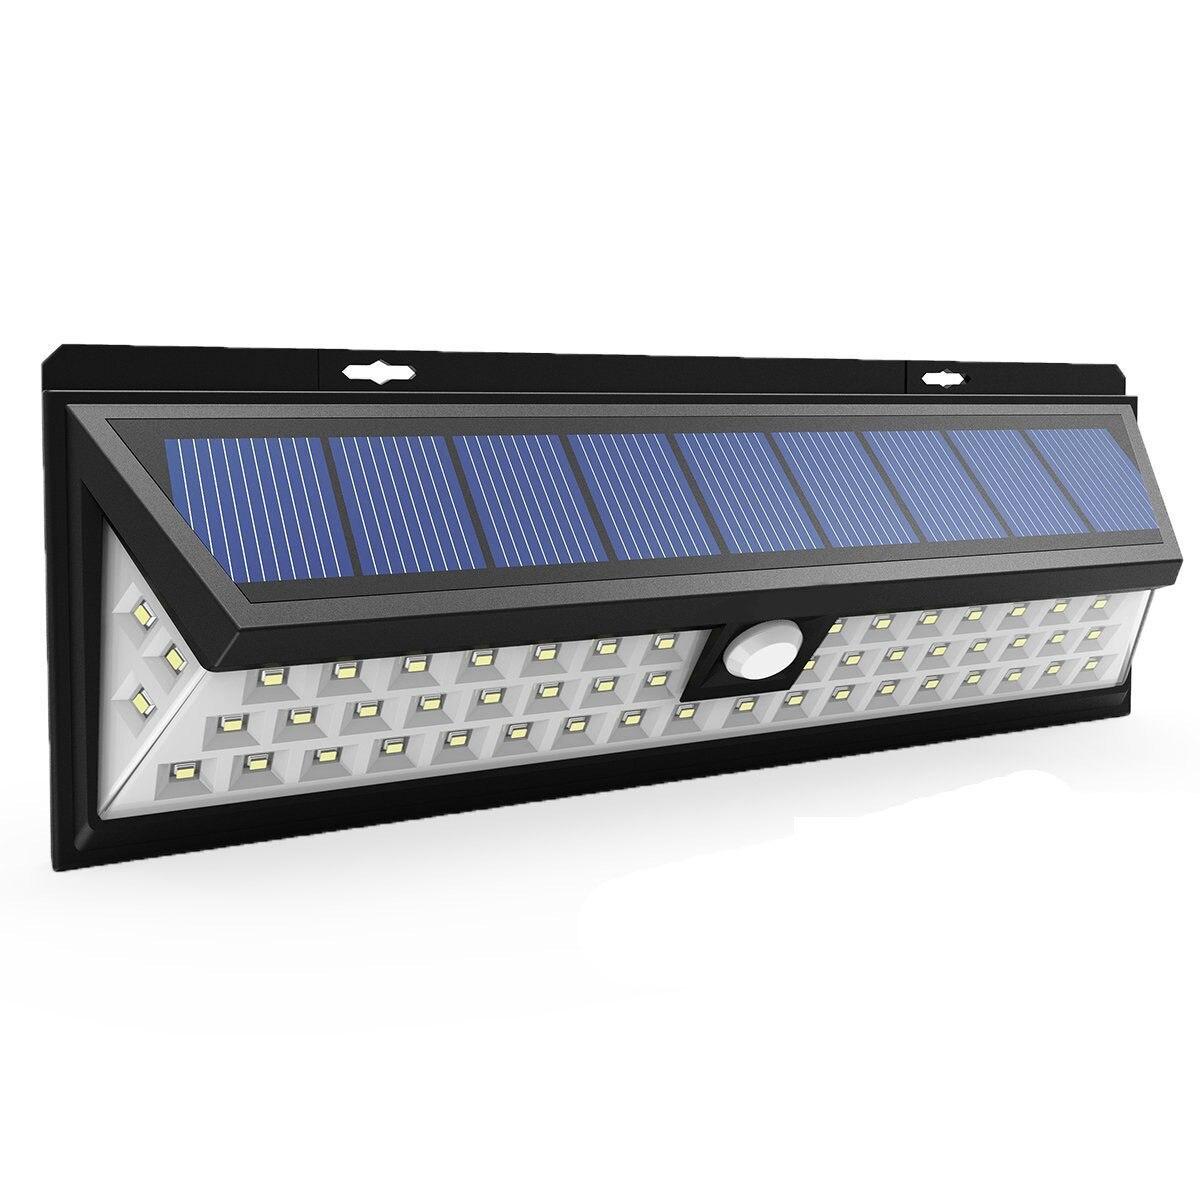 Solar Light 34-118 LED Motion Sensor Outdoor Light IP65 Waterproof Three-sided Solar Garden Light Suitable For Outdoor Lighting